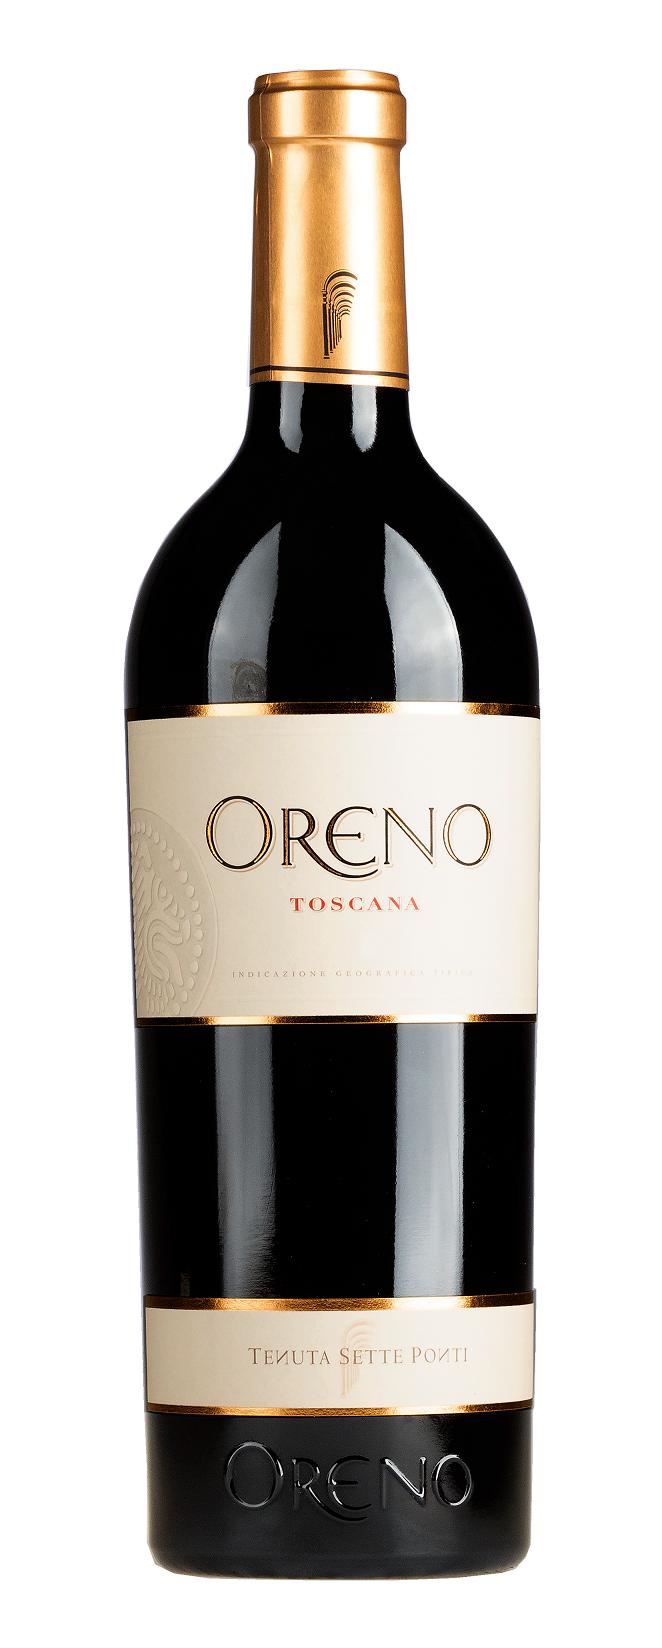 Sette Ponti, Tenuta - Toskana 2018 Oreno Rosso Toscana, Tenuta Sette Ponti